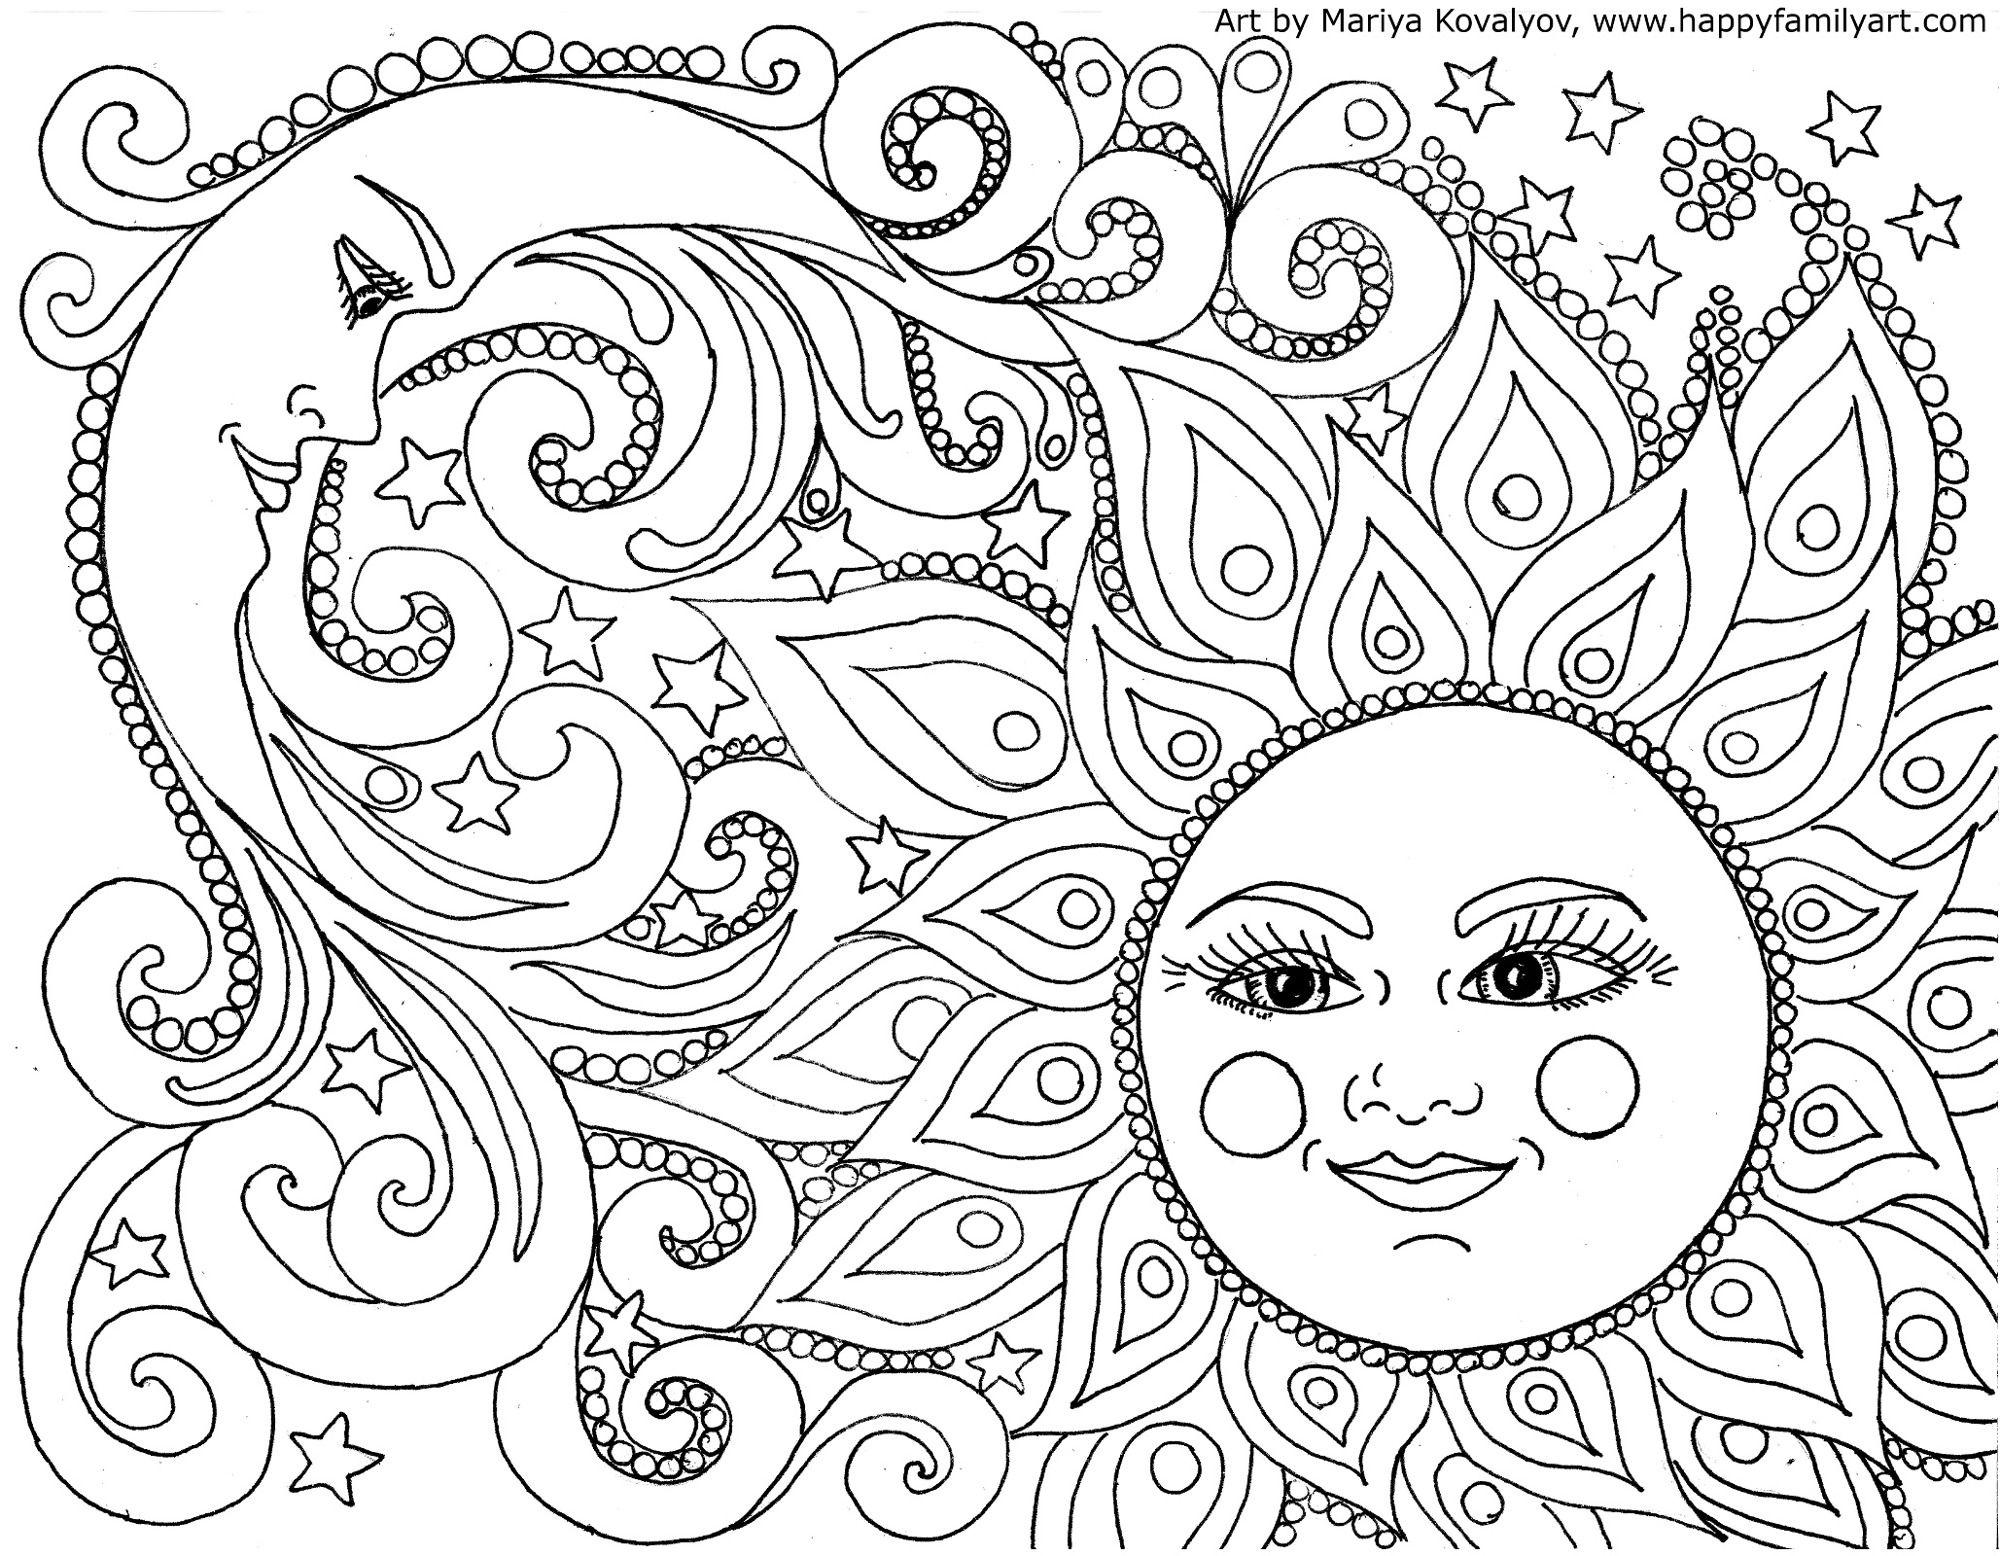 2000x1556 Mandala Coloring Pages Printable Free Kids Gallery Free Coloring